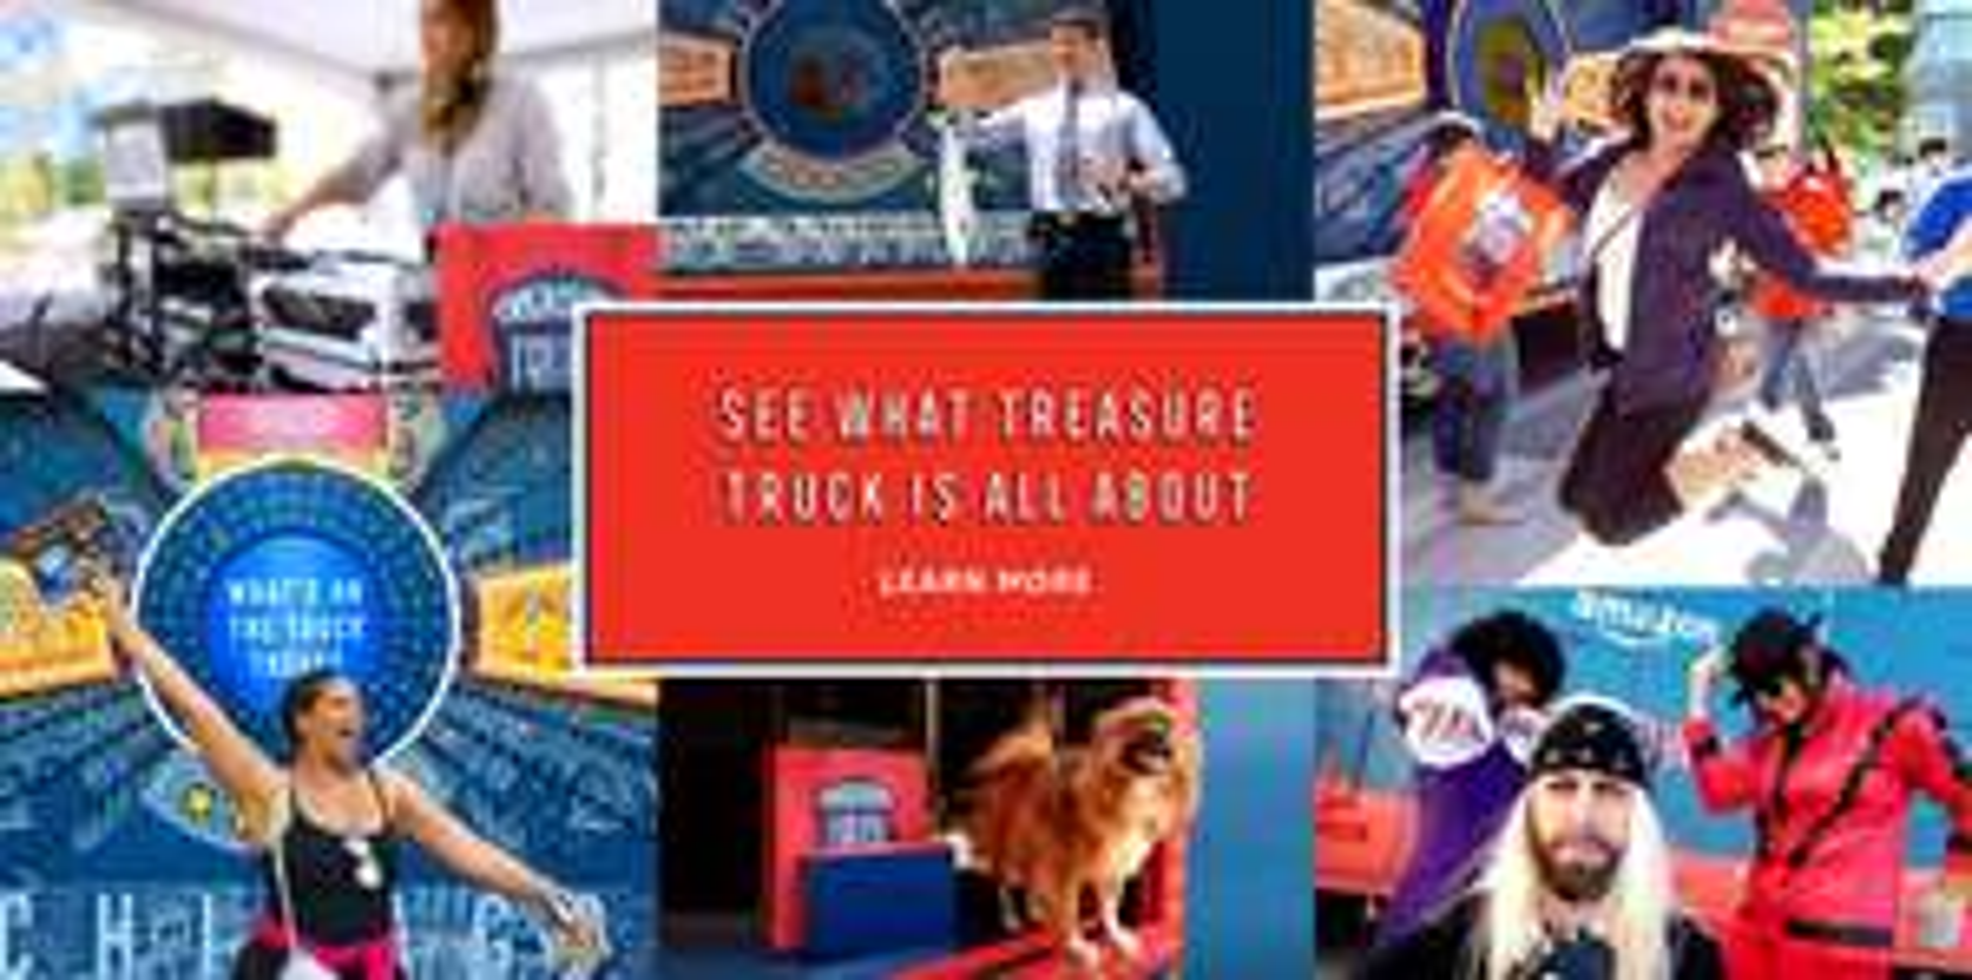 amazon treasure truck (aka the tat truck) Beef Steak and Bone Marrow Gourmet Burger Box for 4 (50% off) and Free Dessert Voucher from TGI Fridays - £9.99